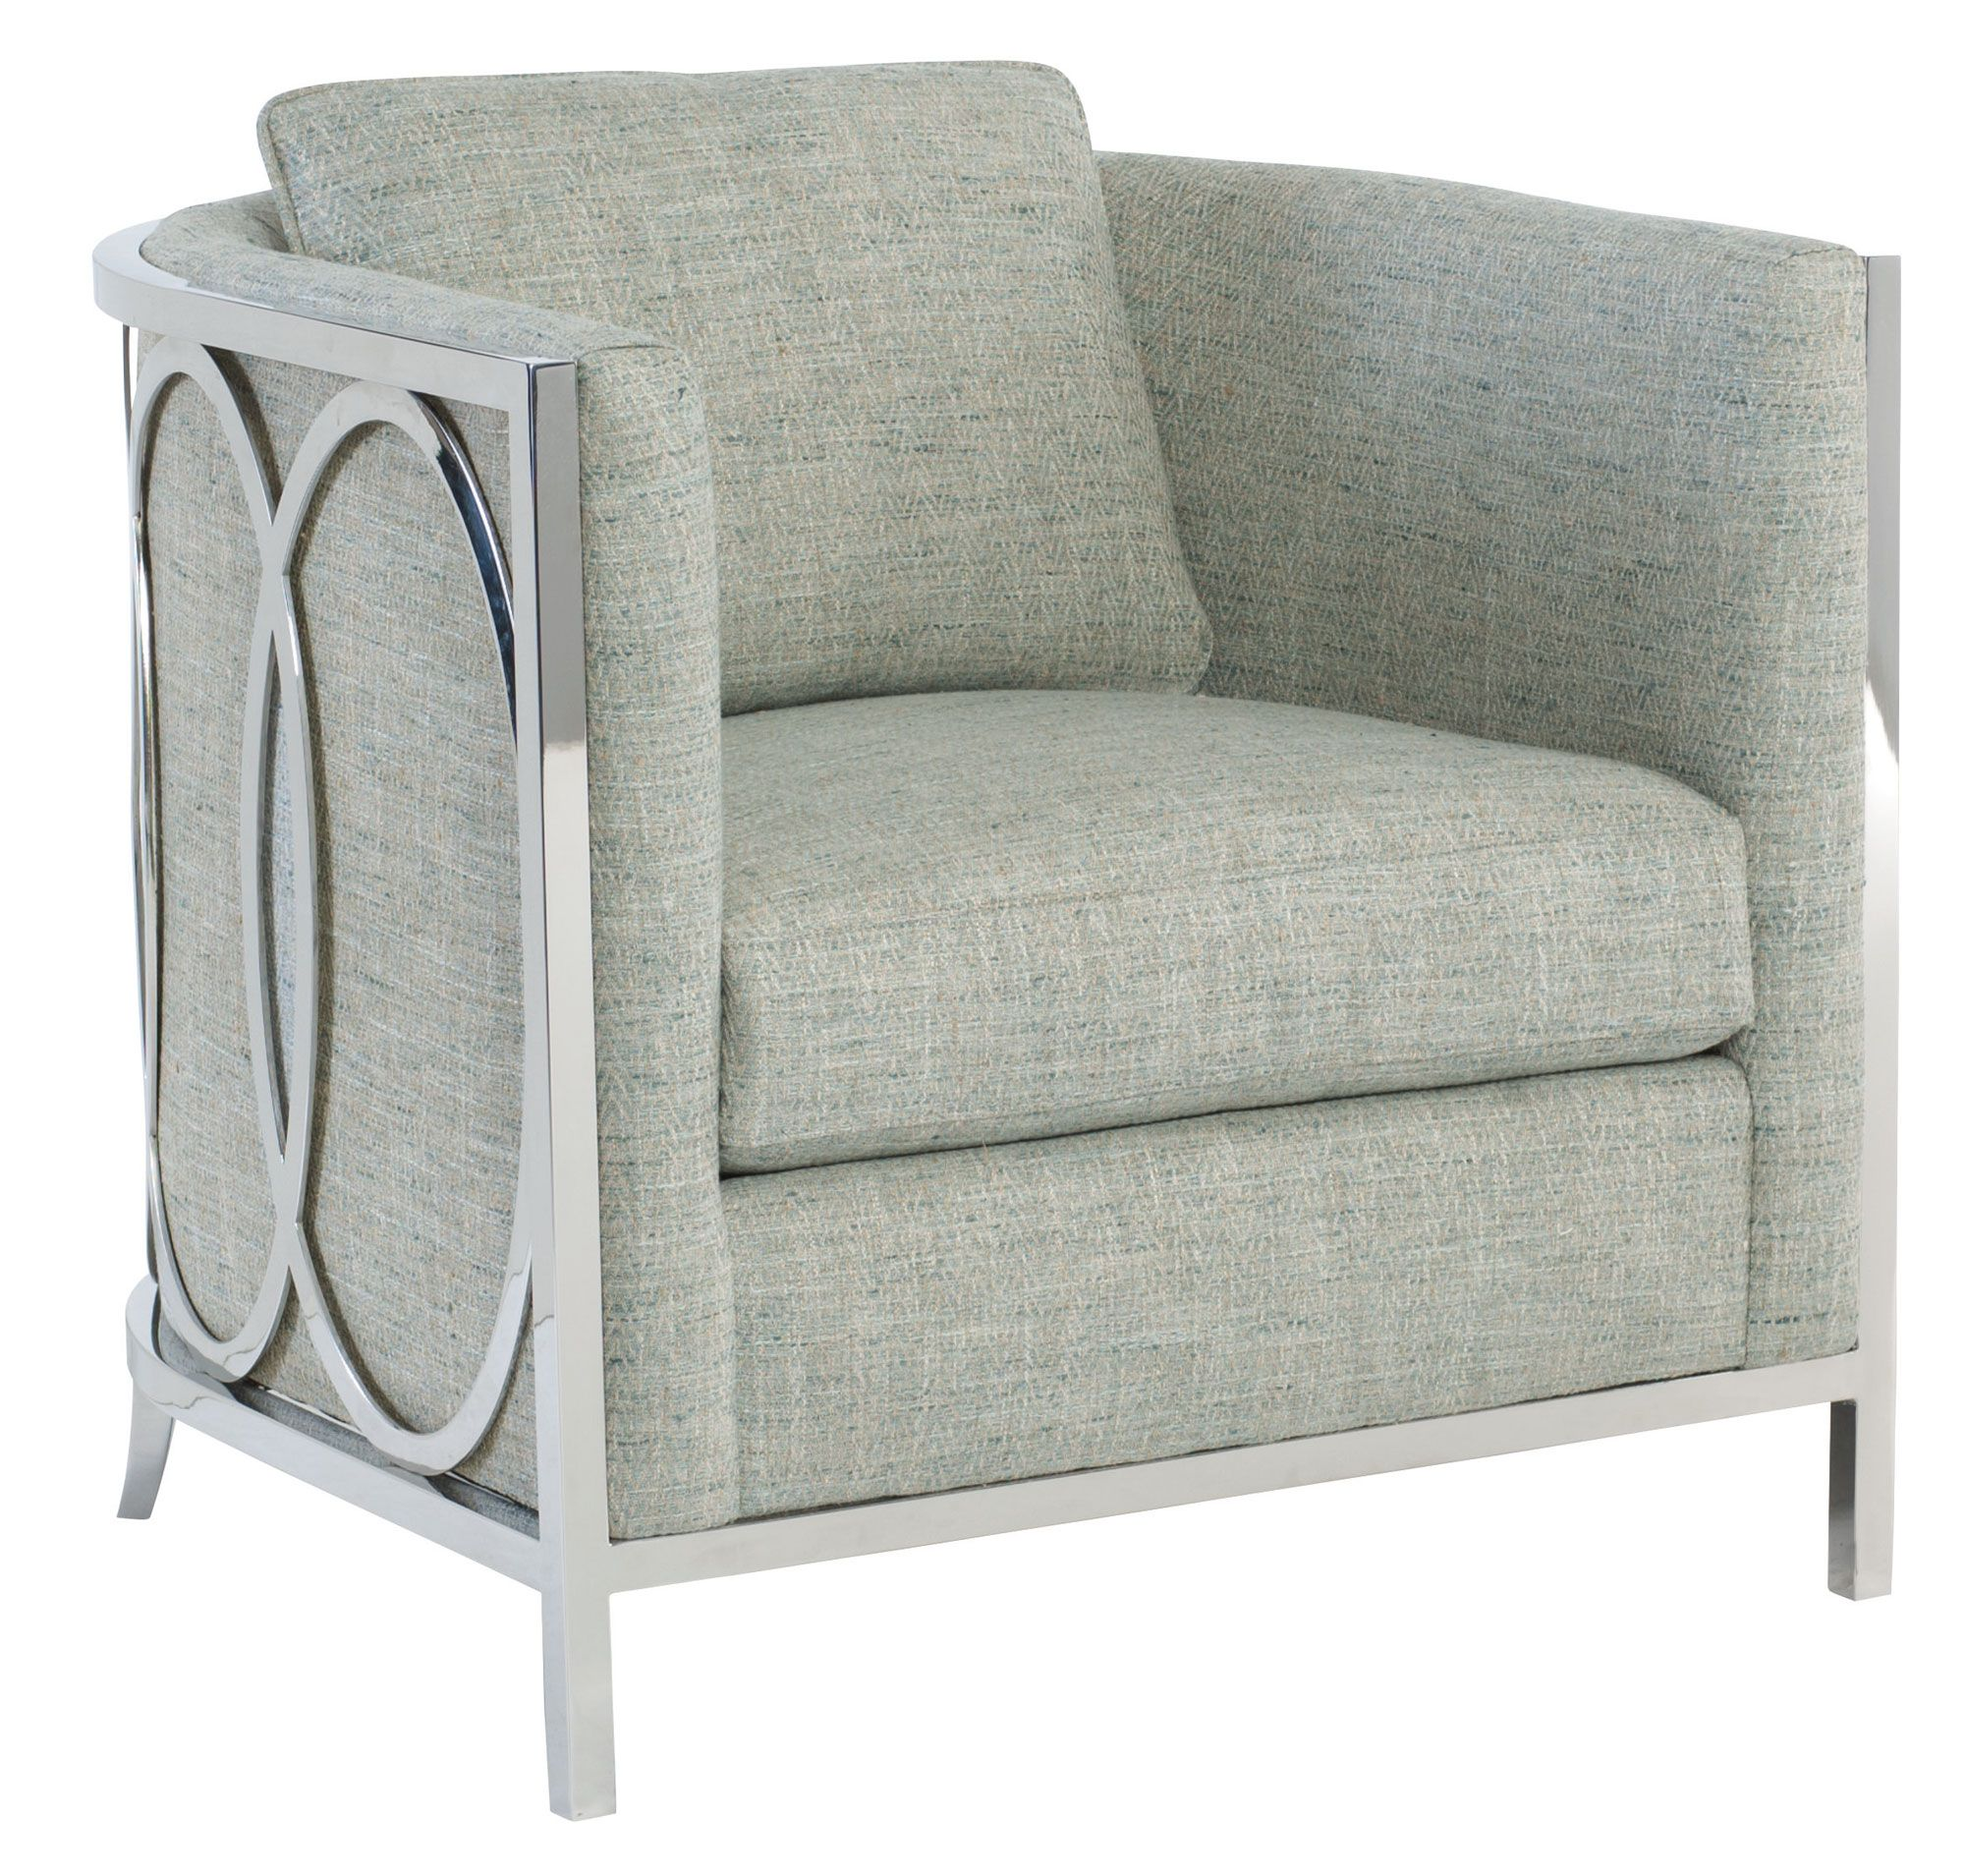 Chair   Bernhardt Poss Ft If We Canu0027t Find Pink Ones · Bernhardt FurnitureBernhardt  SofaClub ...